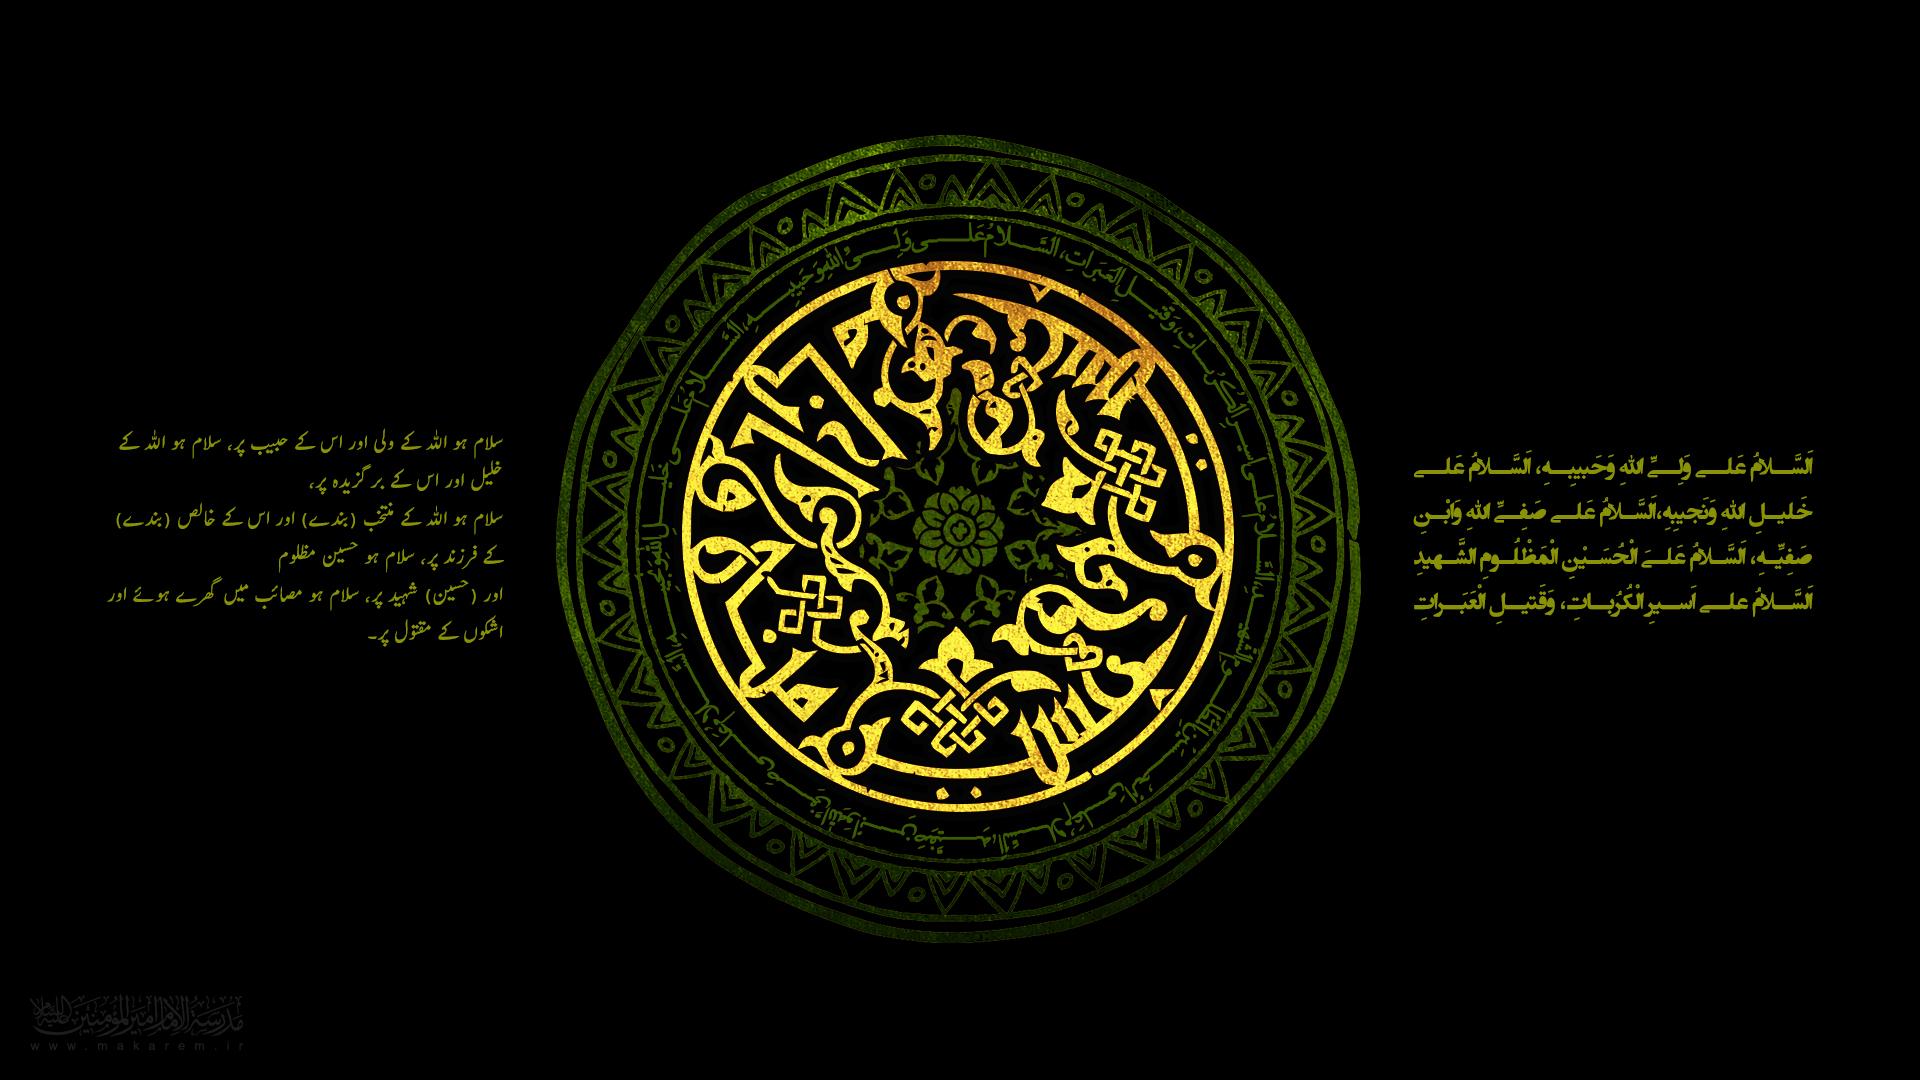 اربعین 5-مدرسه الامام امیر المومنین (ع)